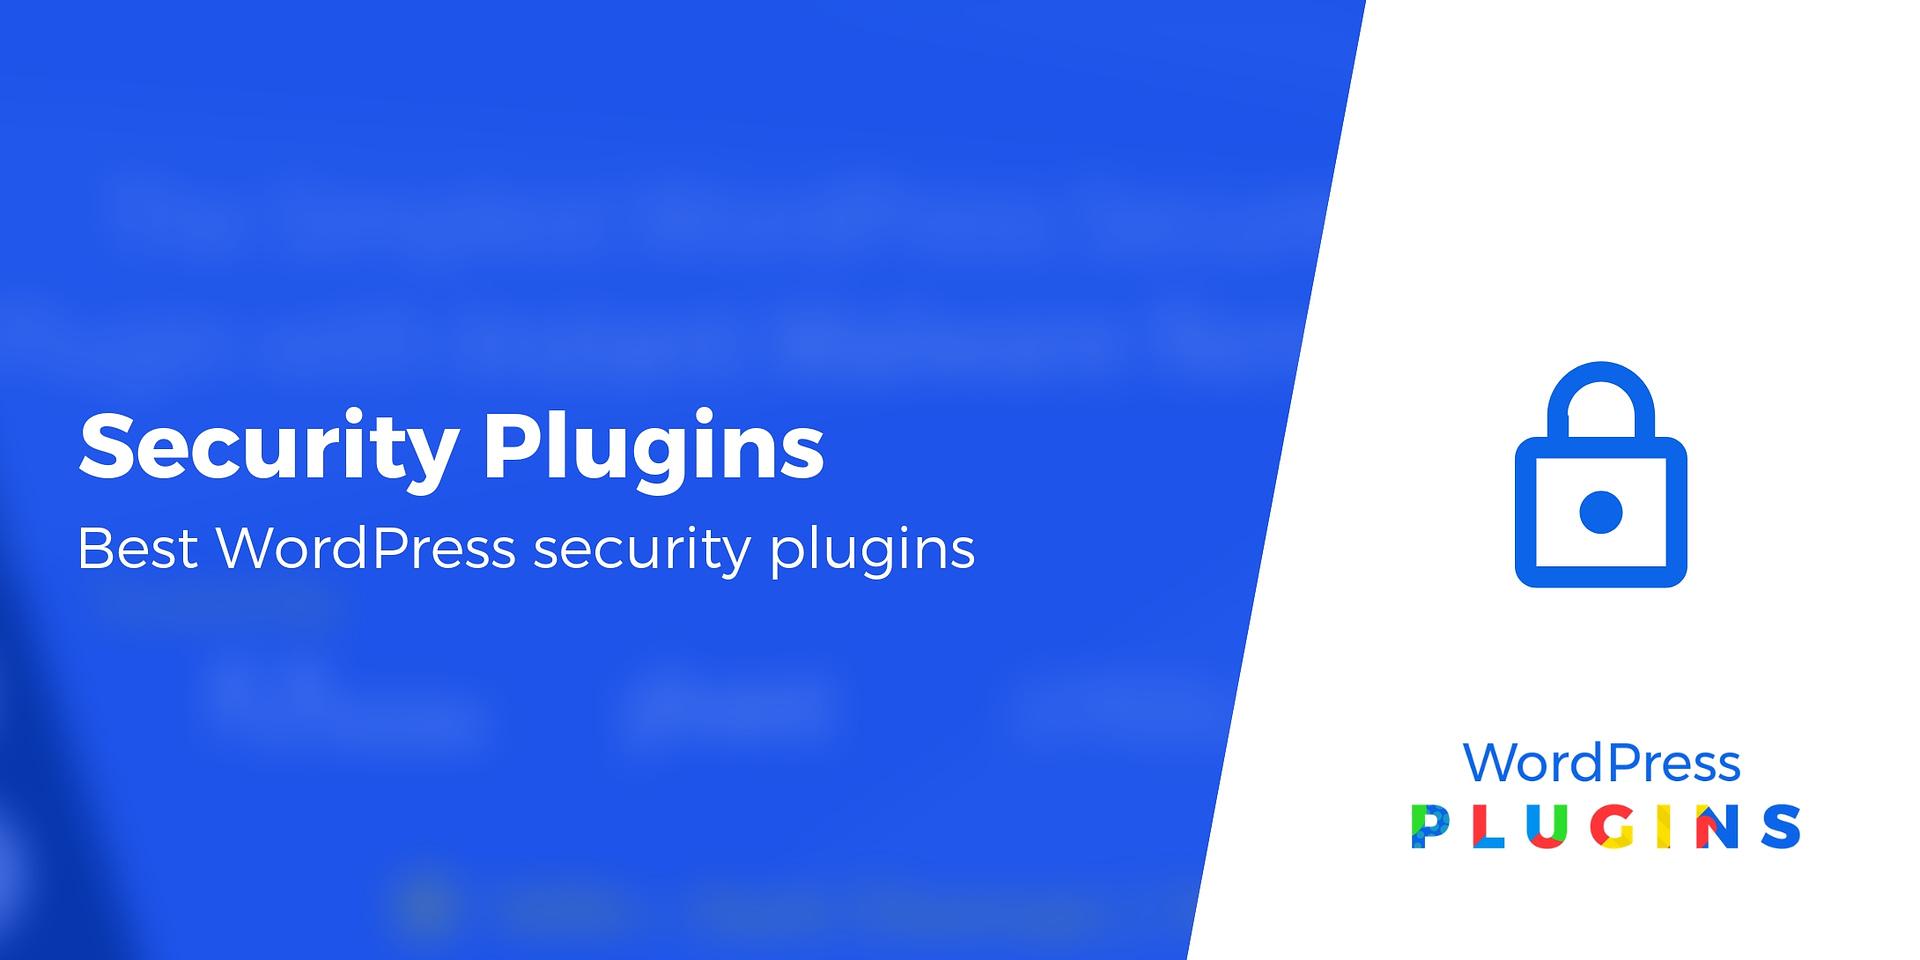 11 Best WordPress Security Plugins: Plus How to Choose the